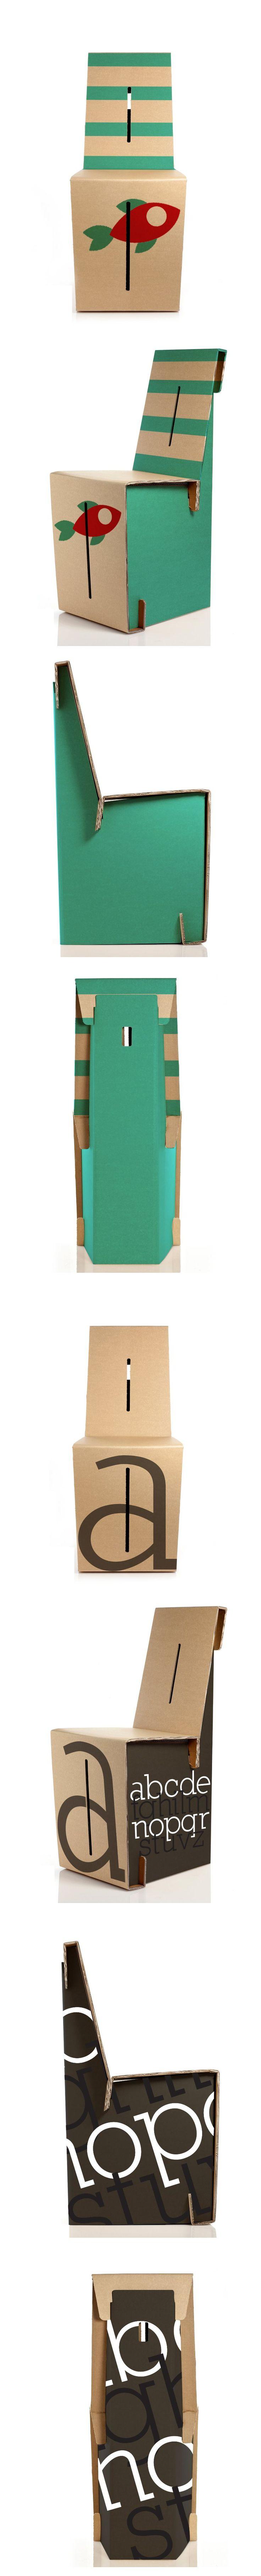 Marianna Guerra #cherryfish #abc #chairplus #contest #kshop #ecodesign #cardboard #style